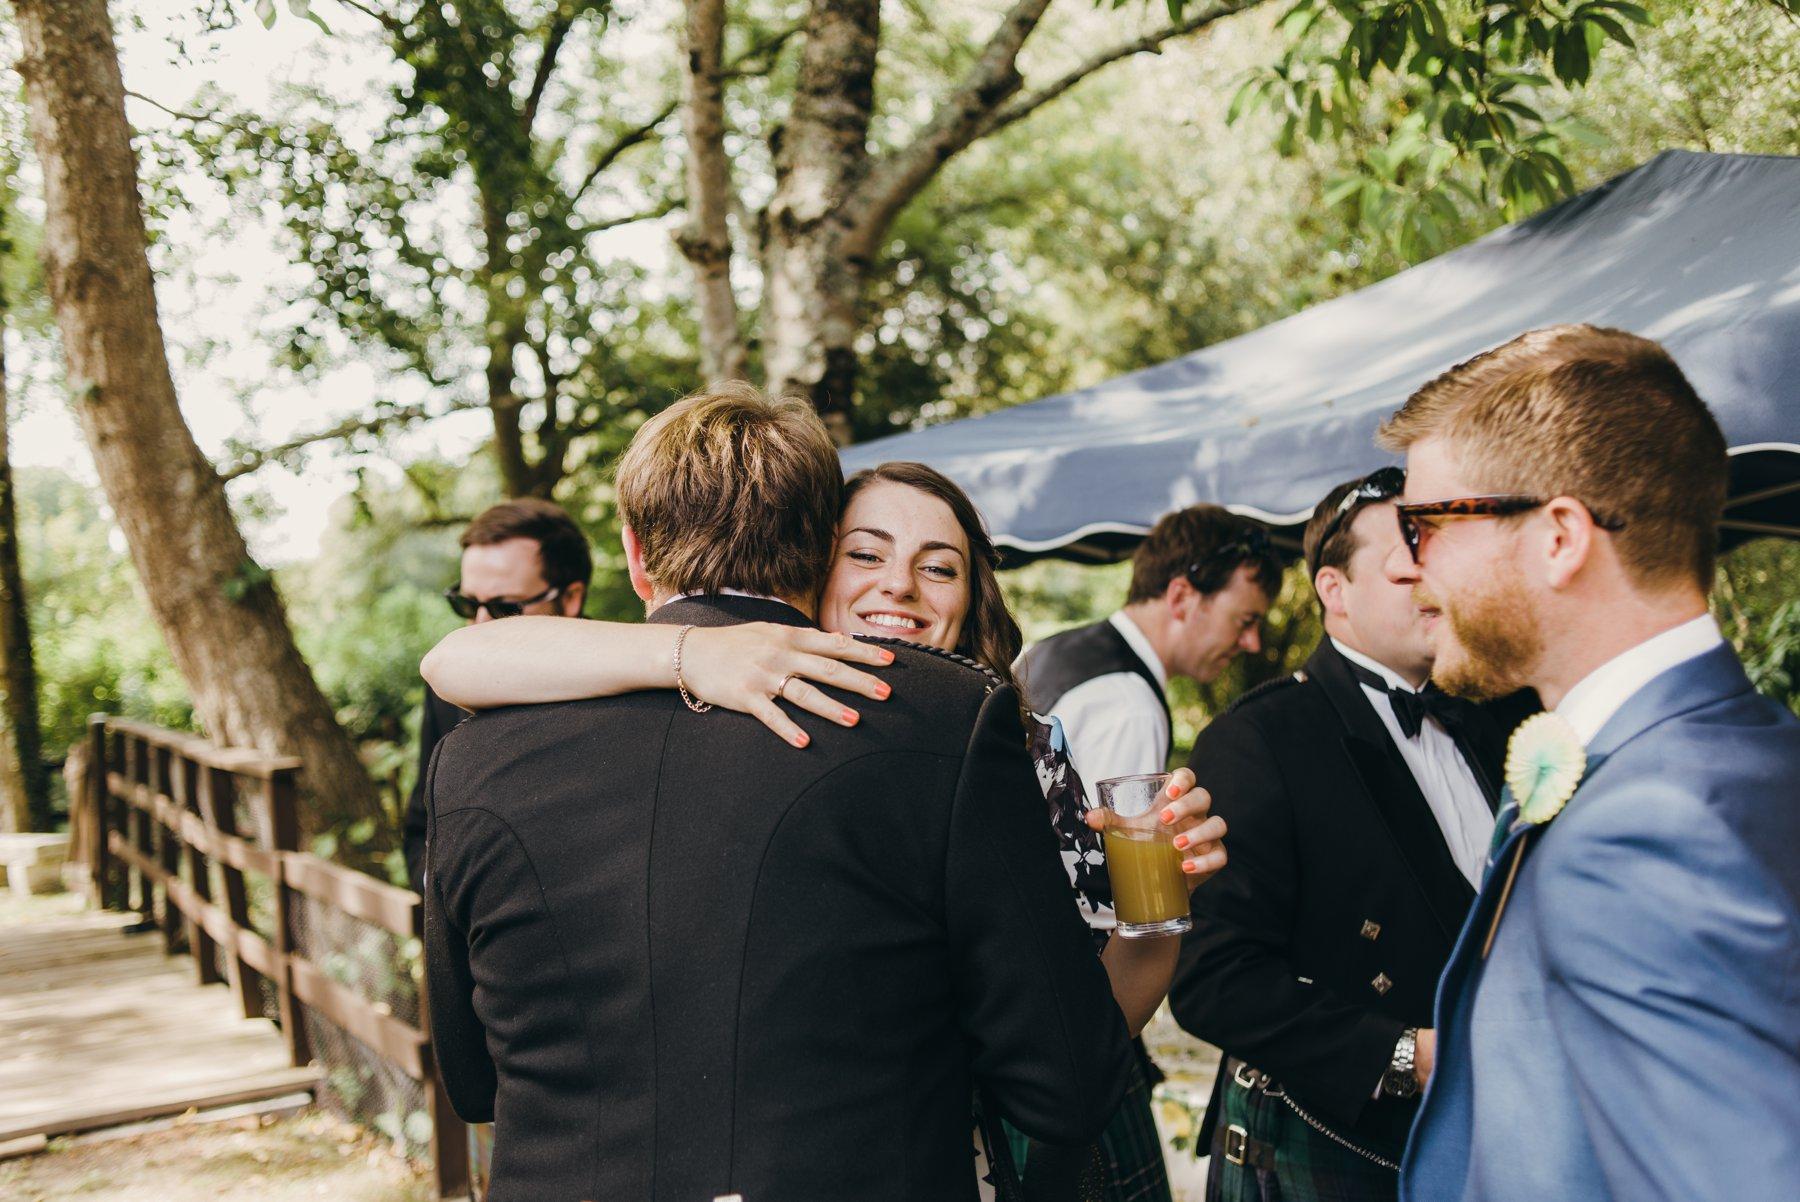 petitmoulin_france_bordeaux_weddings_0061